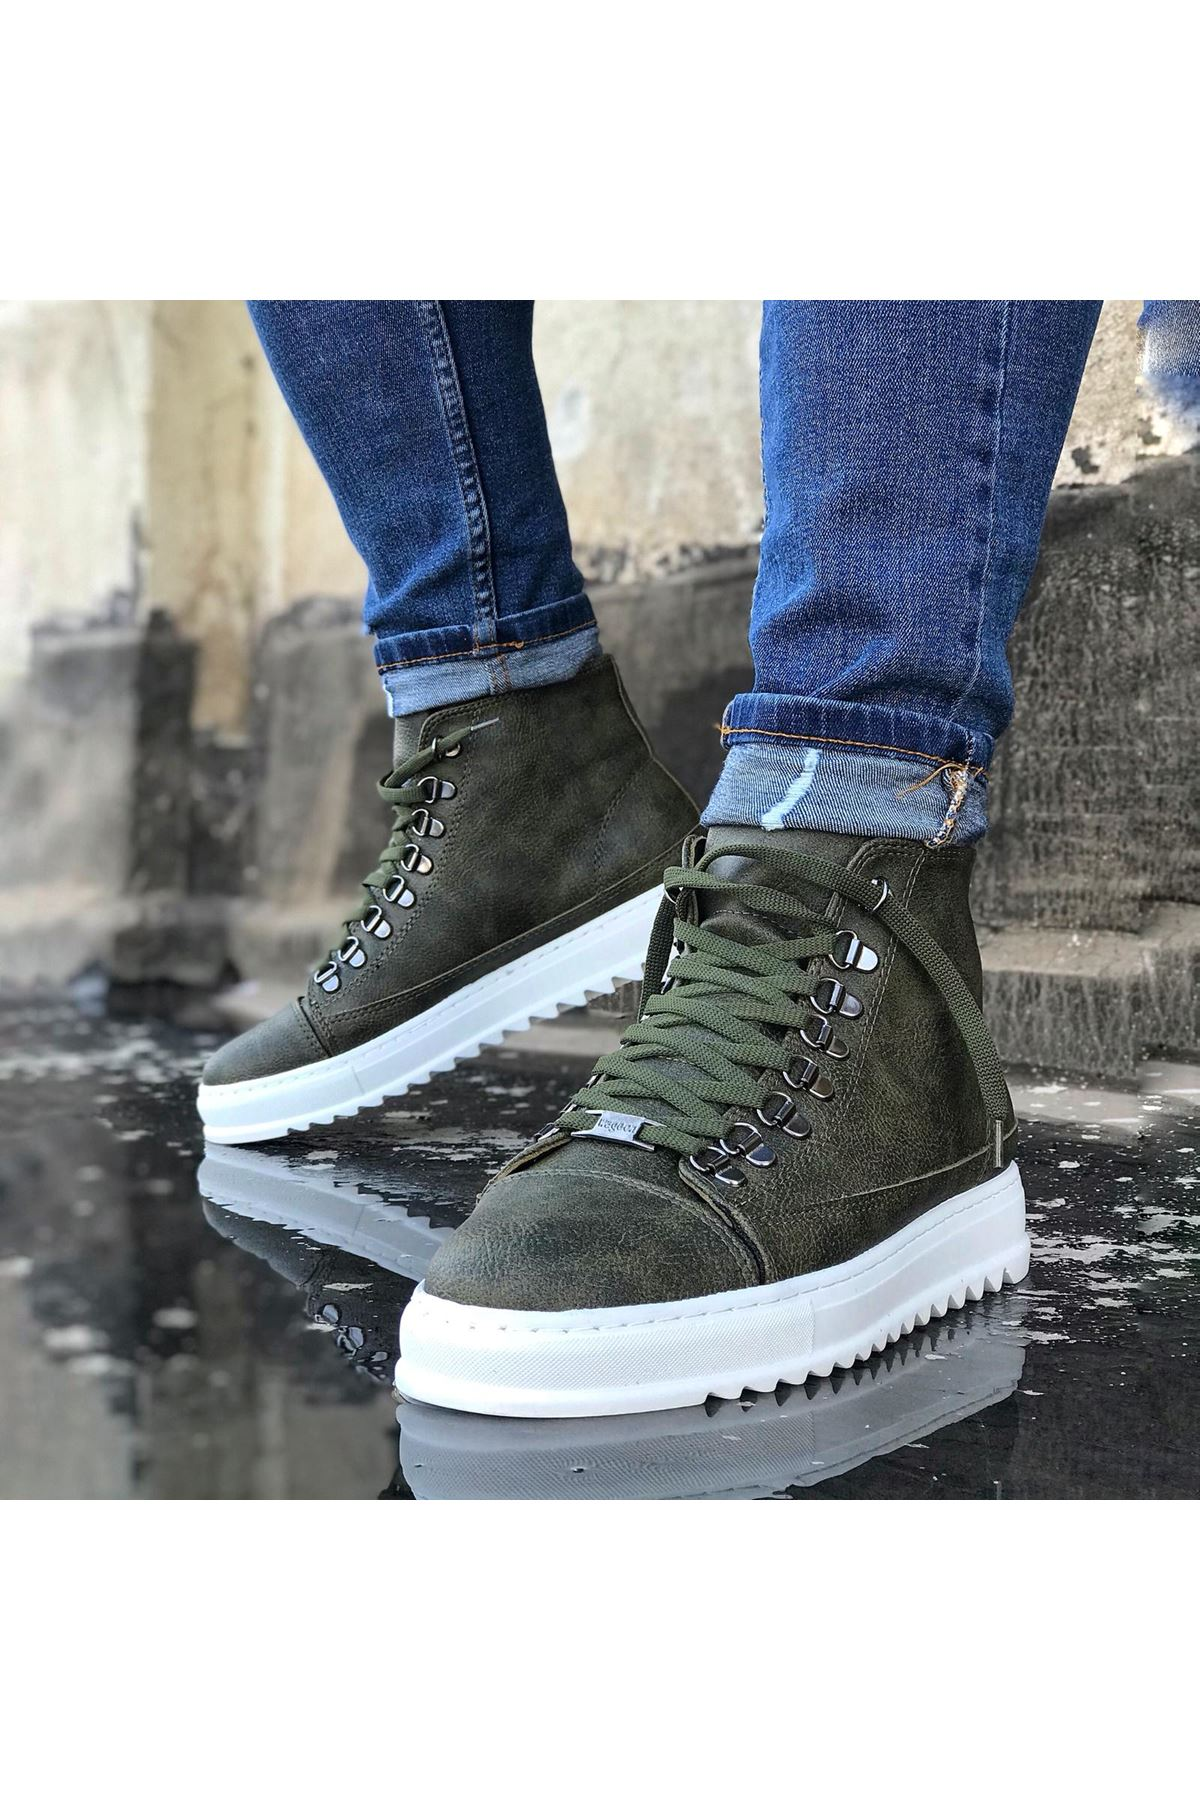 Wagoon WG034 Haki Bağcıklı Sneakers  Yarım Bilek Bot